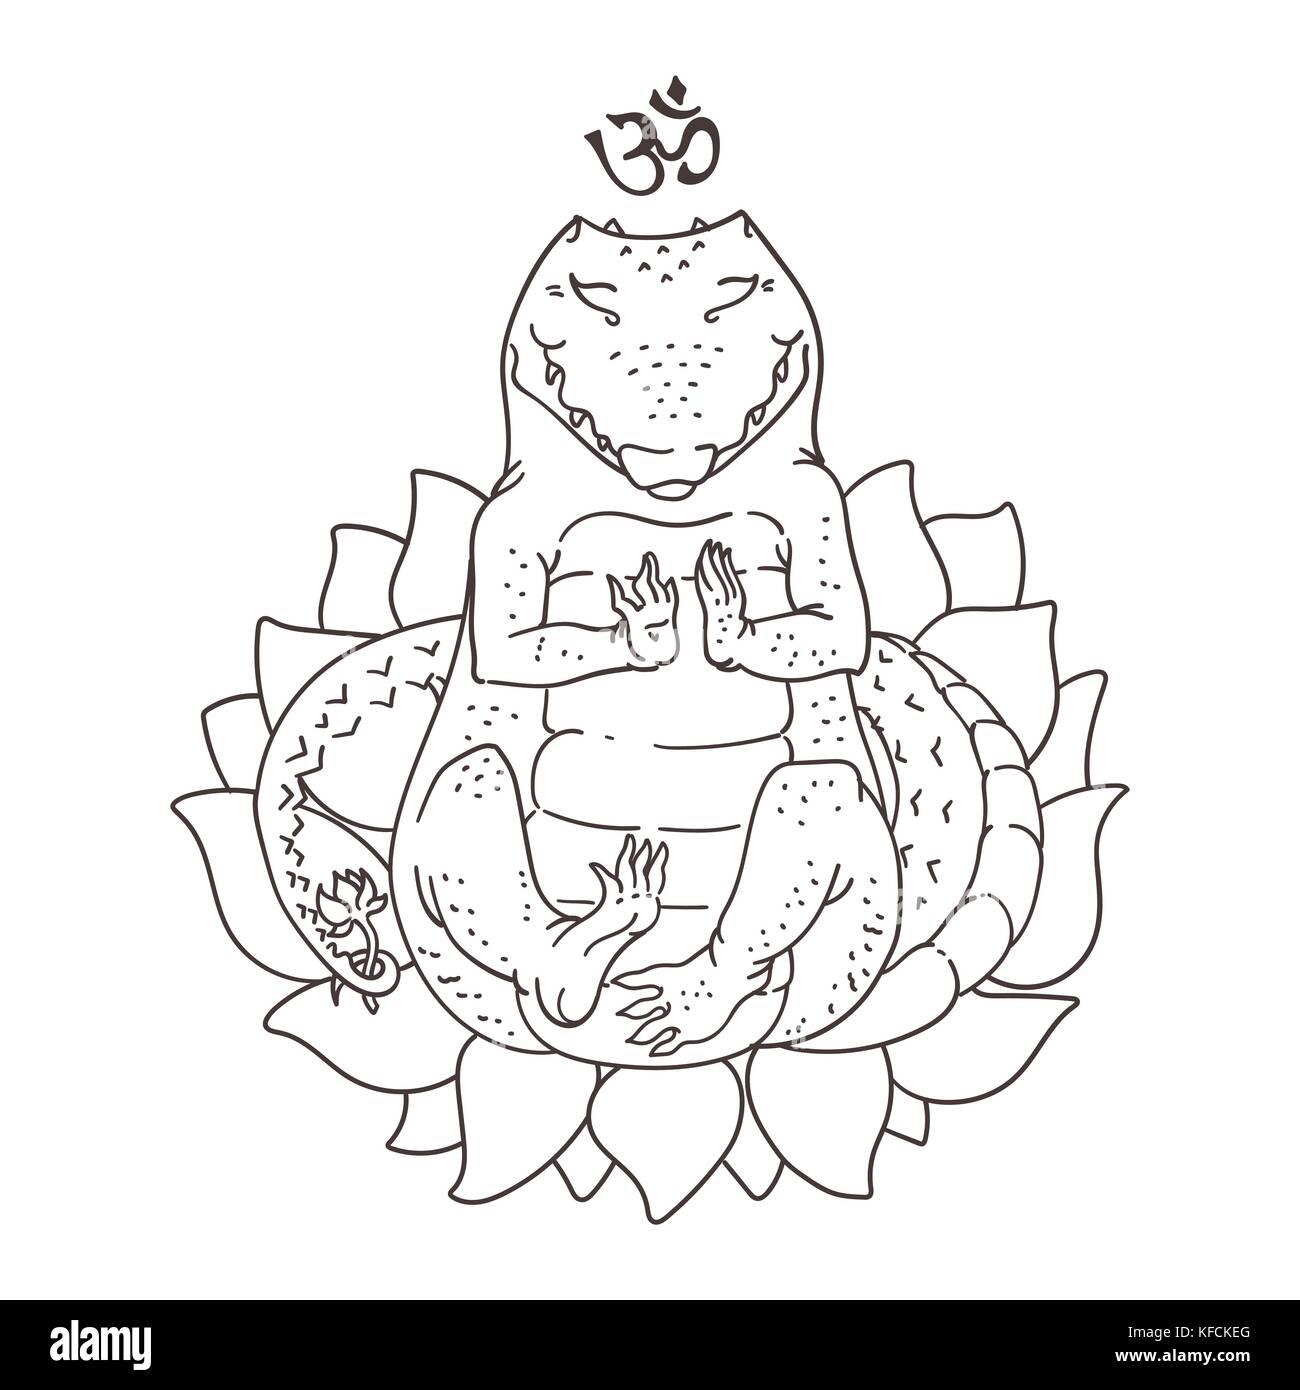 Illustrazione Vettoriale Di Graziosi Alligator Seduti In Meditazione